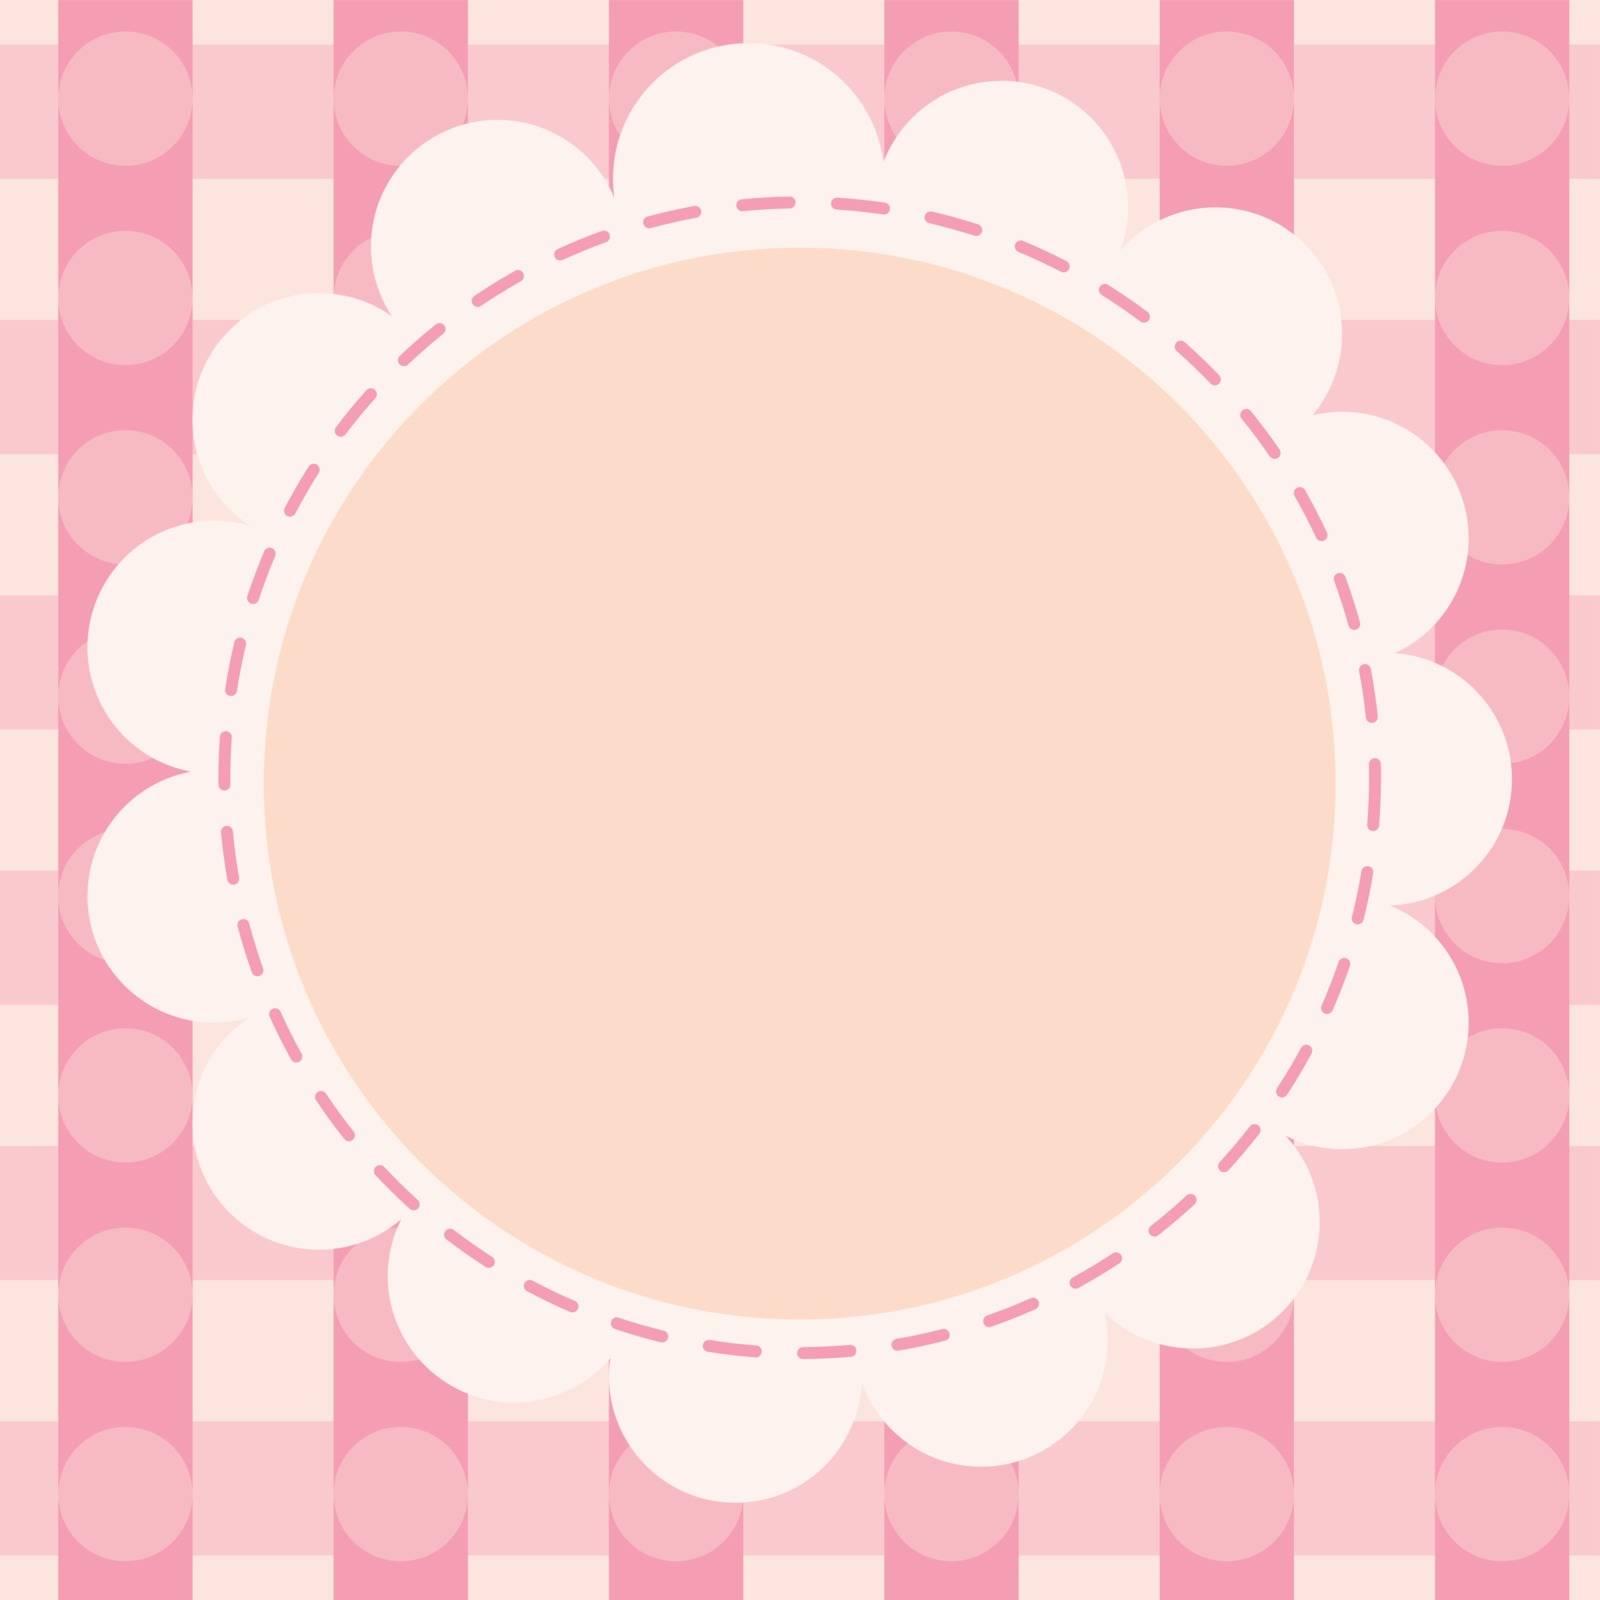 illustration of a pink wallpaper